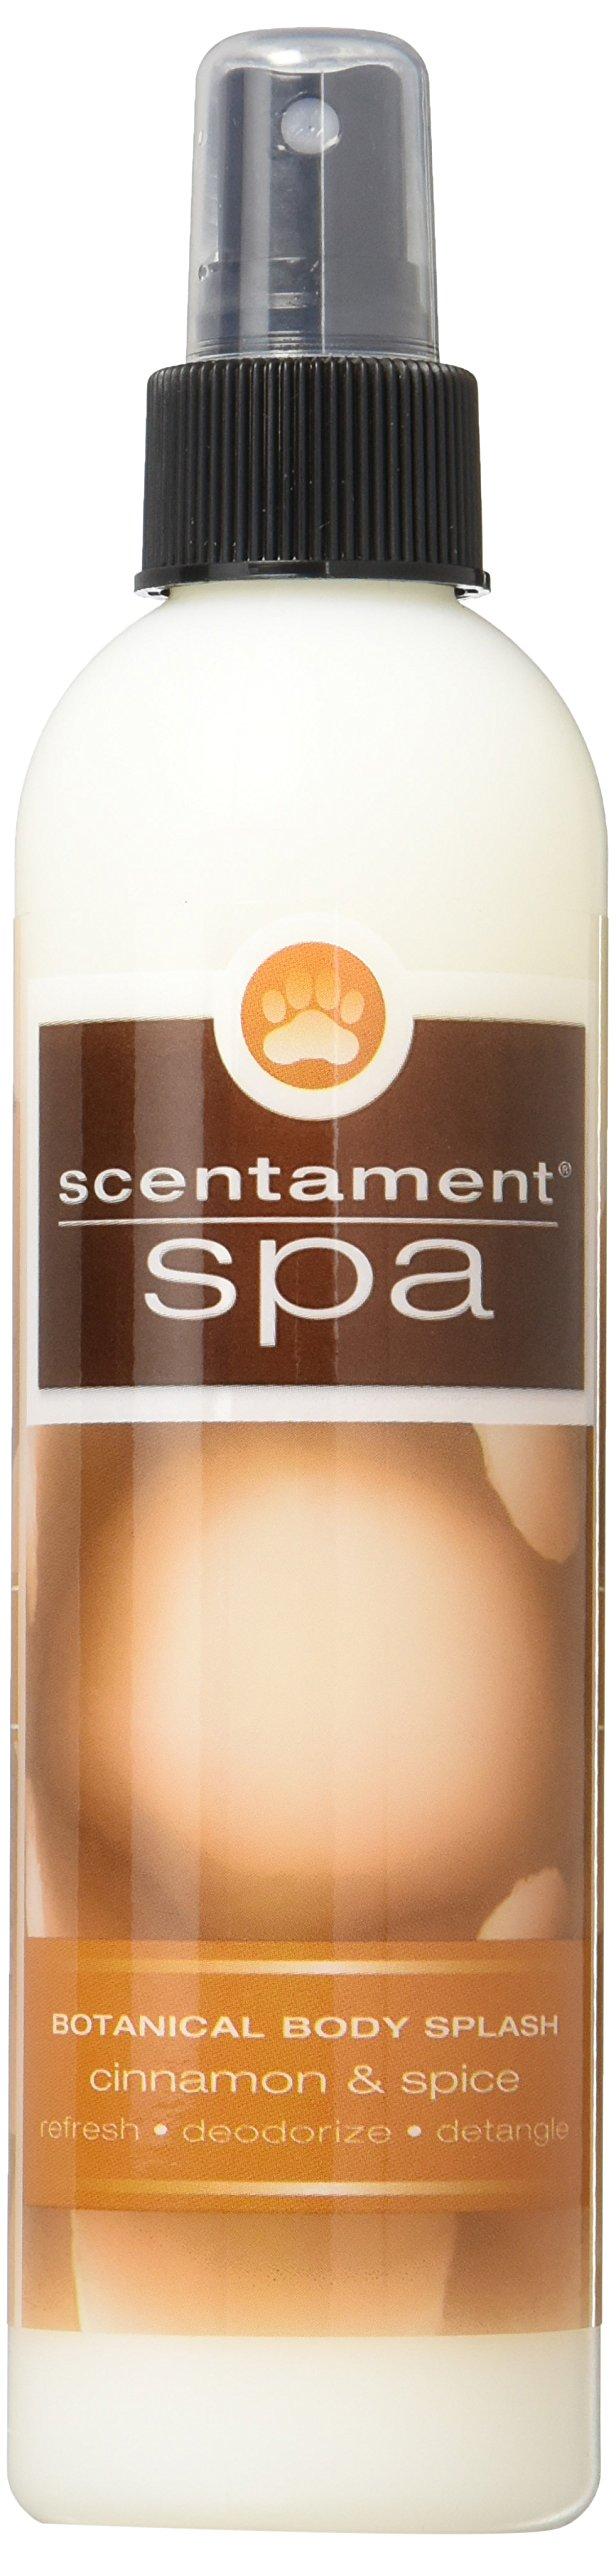 Best Shot Pet Scentament Spa Cinnamon Spice Body Splash Spray, 8 oz